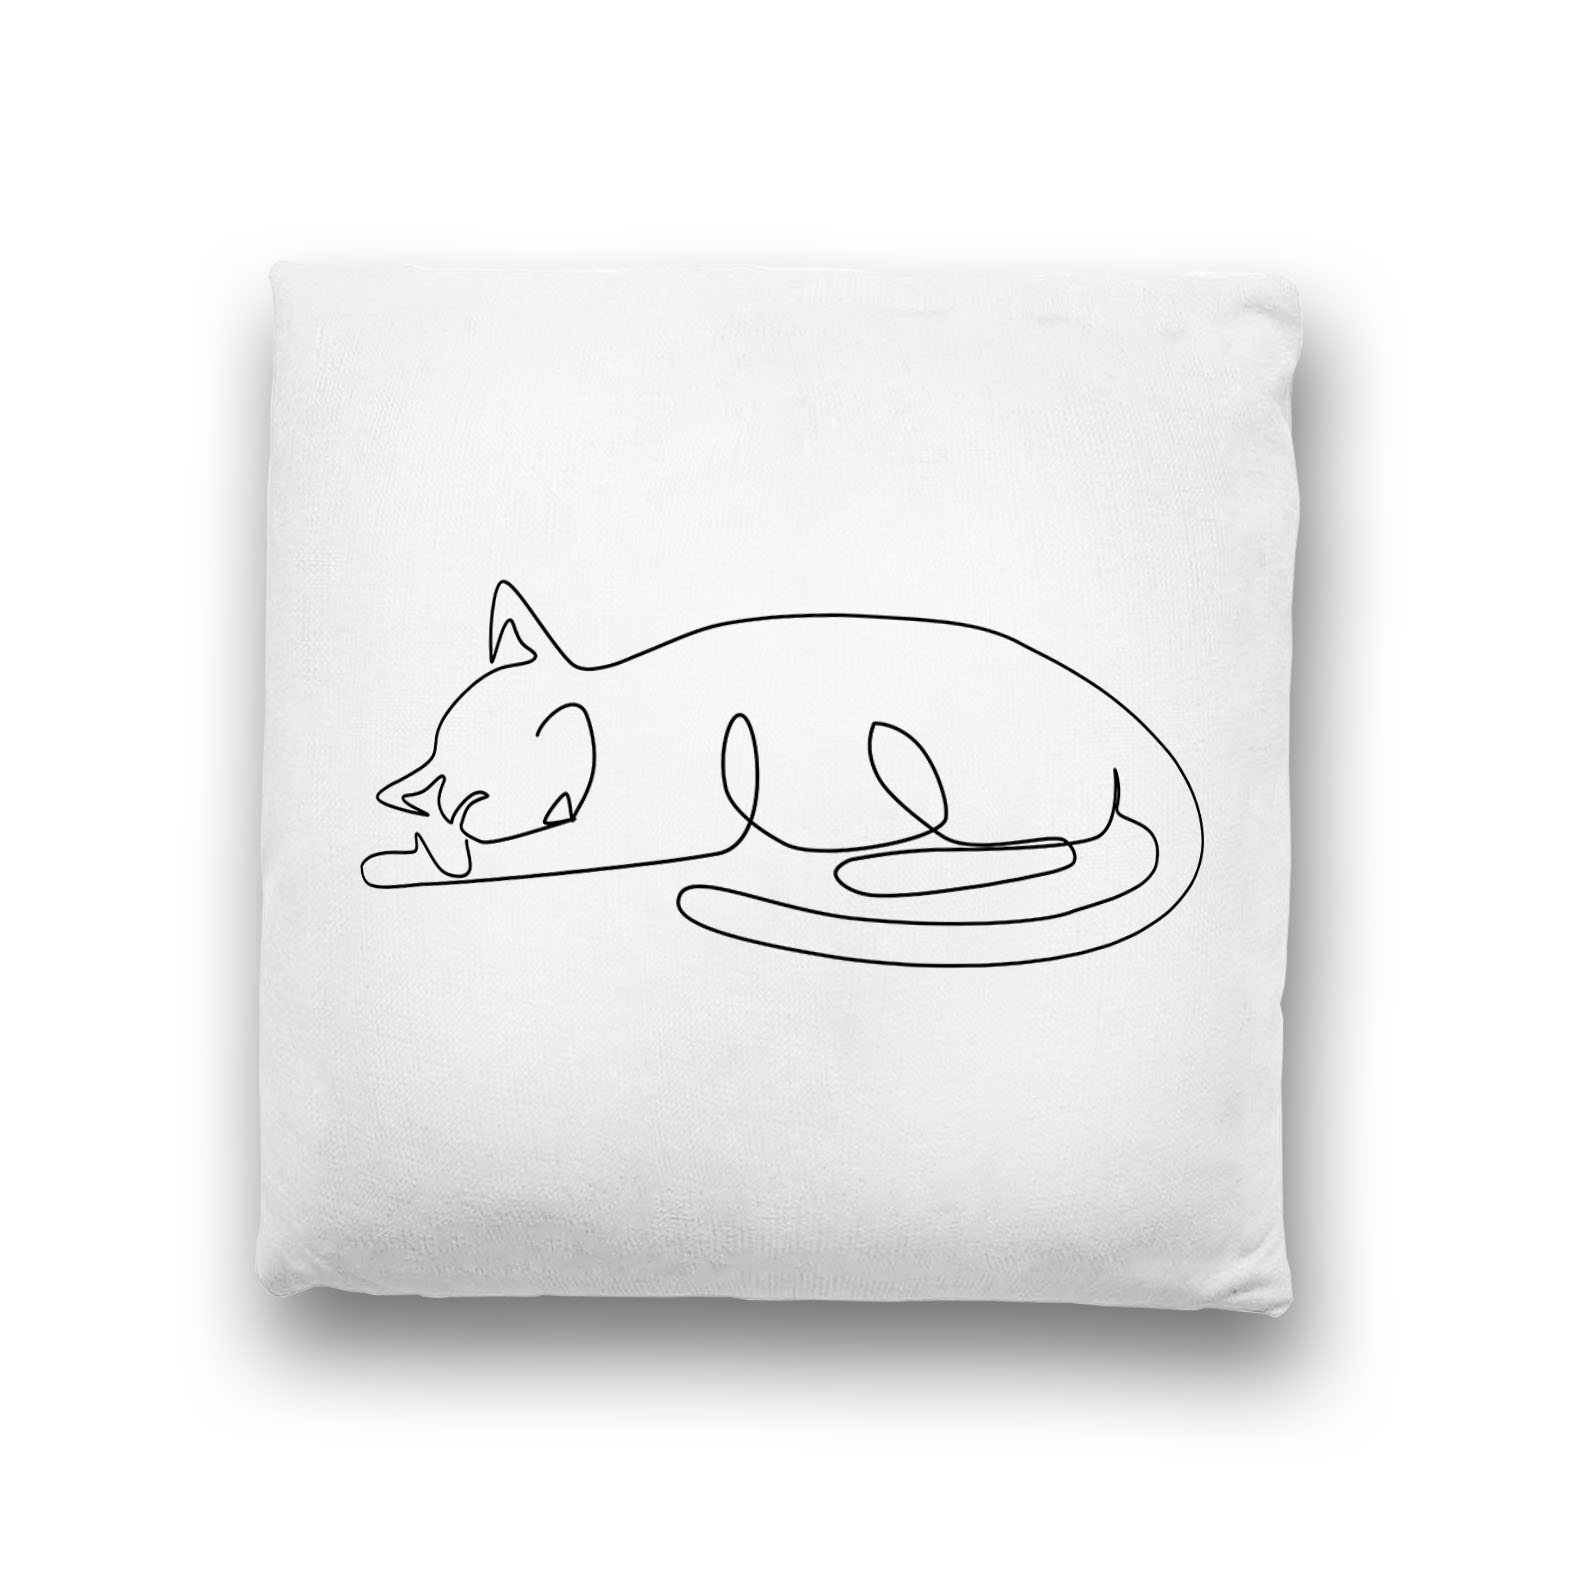 sleeping-cat-minimalist-line-art-throw-pillow